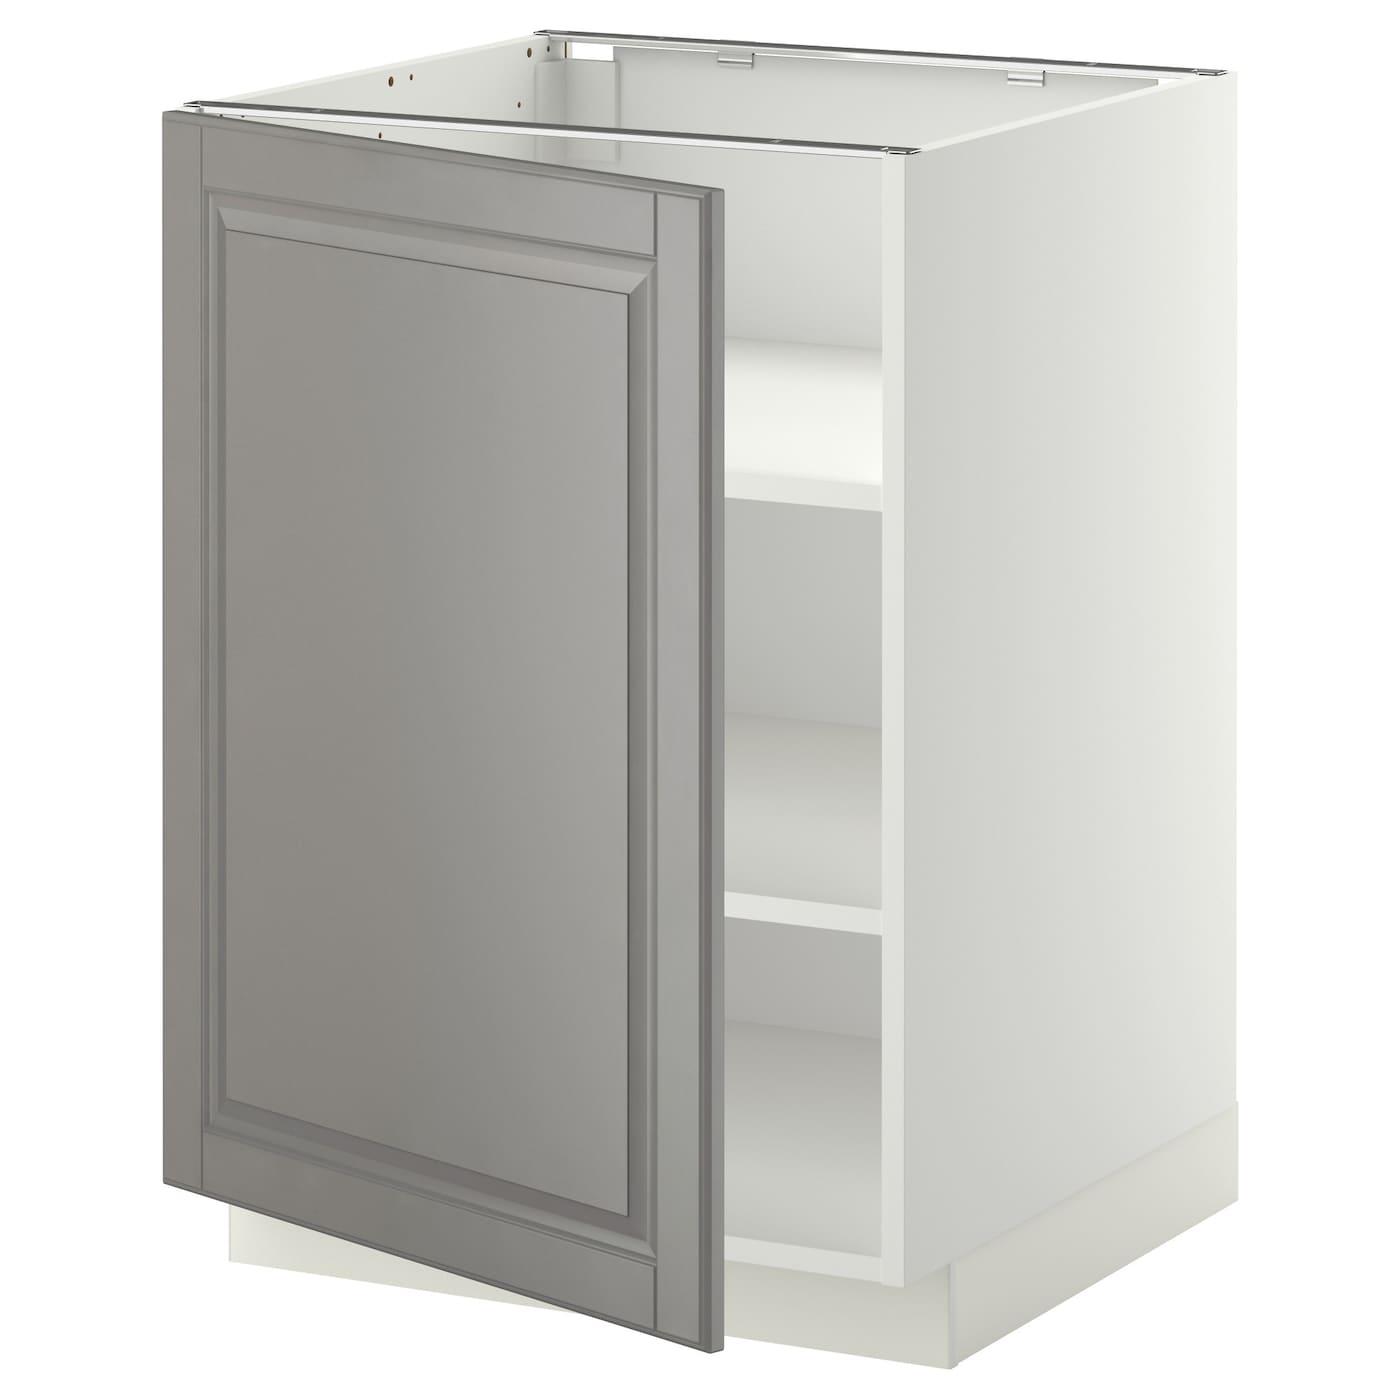 Metod Base Cabinet For Sink Black Järsta Orange 60x60 Cm: METOD Base Cabinet With Shelves White/bodbyn Grey 60x60 Cm